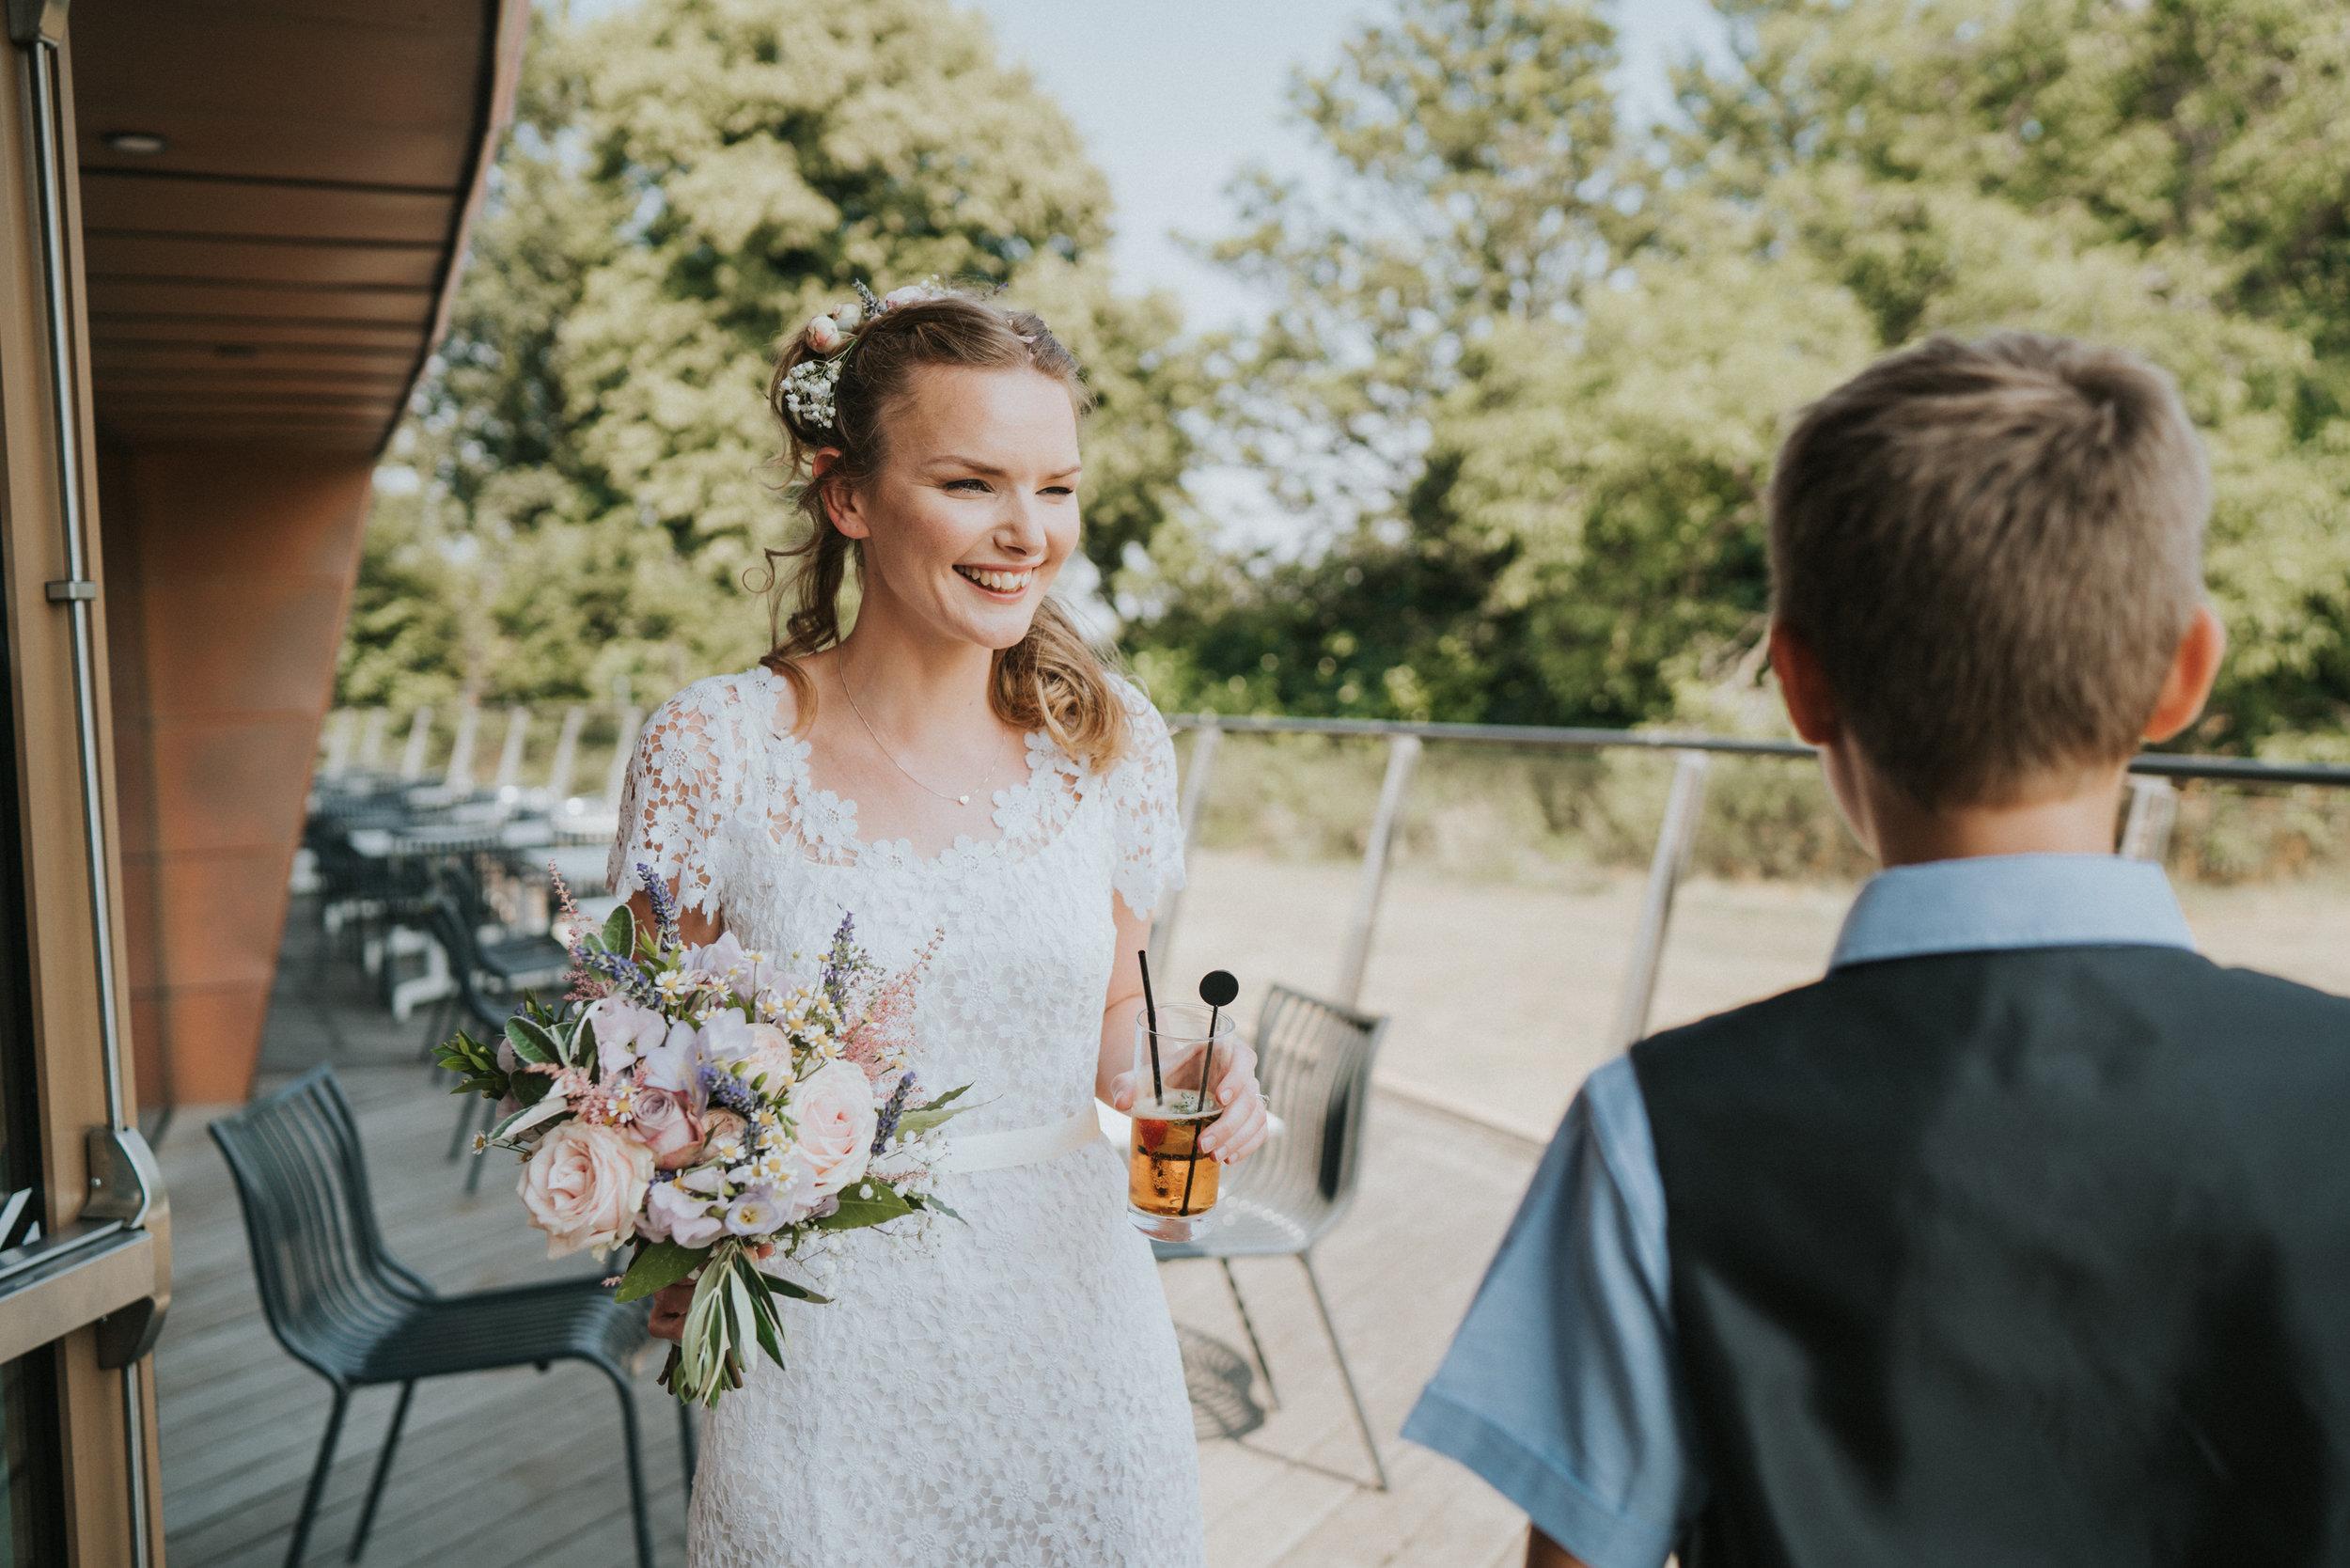 Grace-Elizabeth-Georgie-Amalaketu-Firstsite-Colchester-Essex-Boho-Buddhist-Wedding-Alternative-Wedding-Photography-Essex (67 of 100).jpg